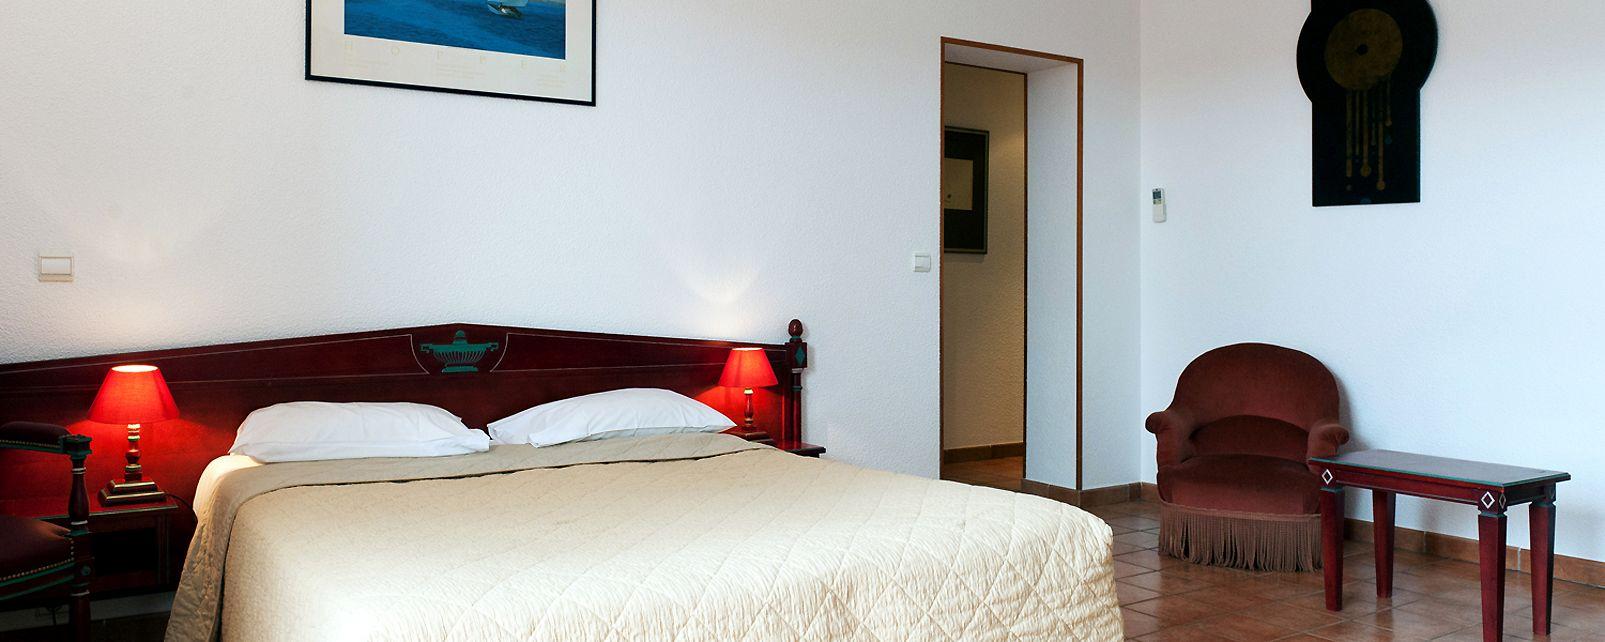 Hotel L'arapède